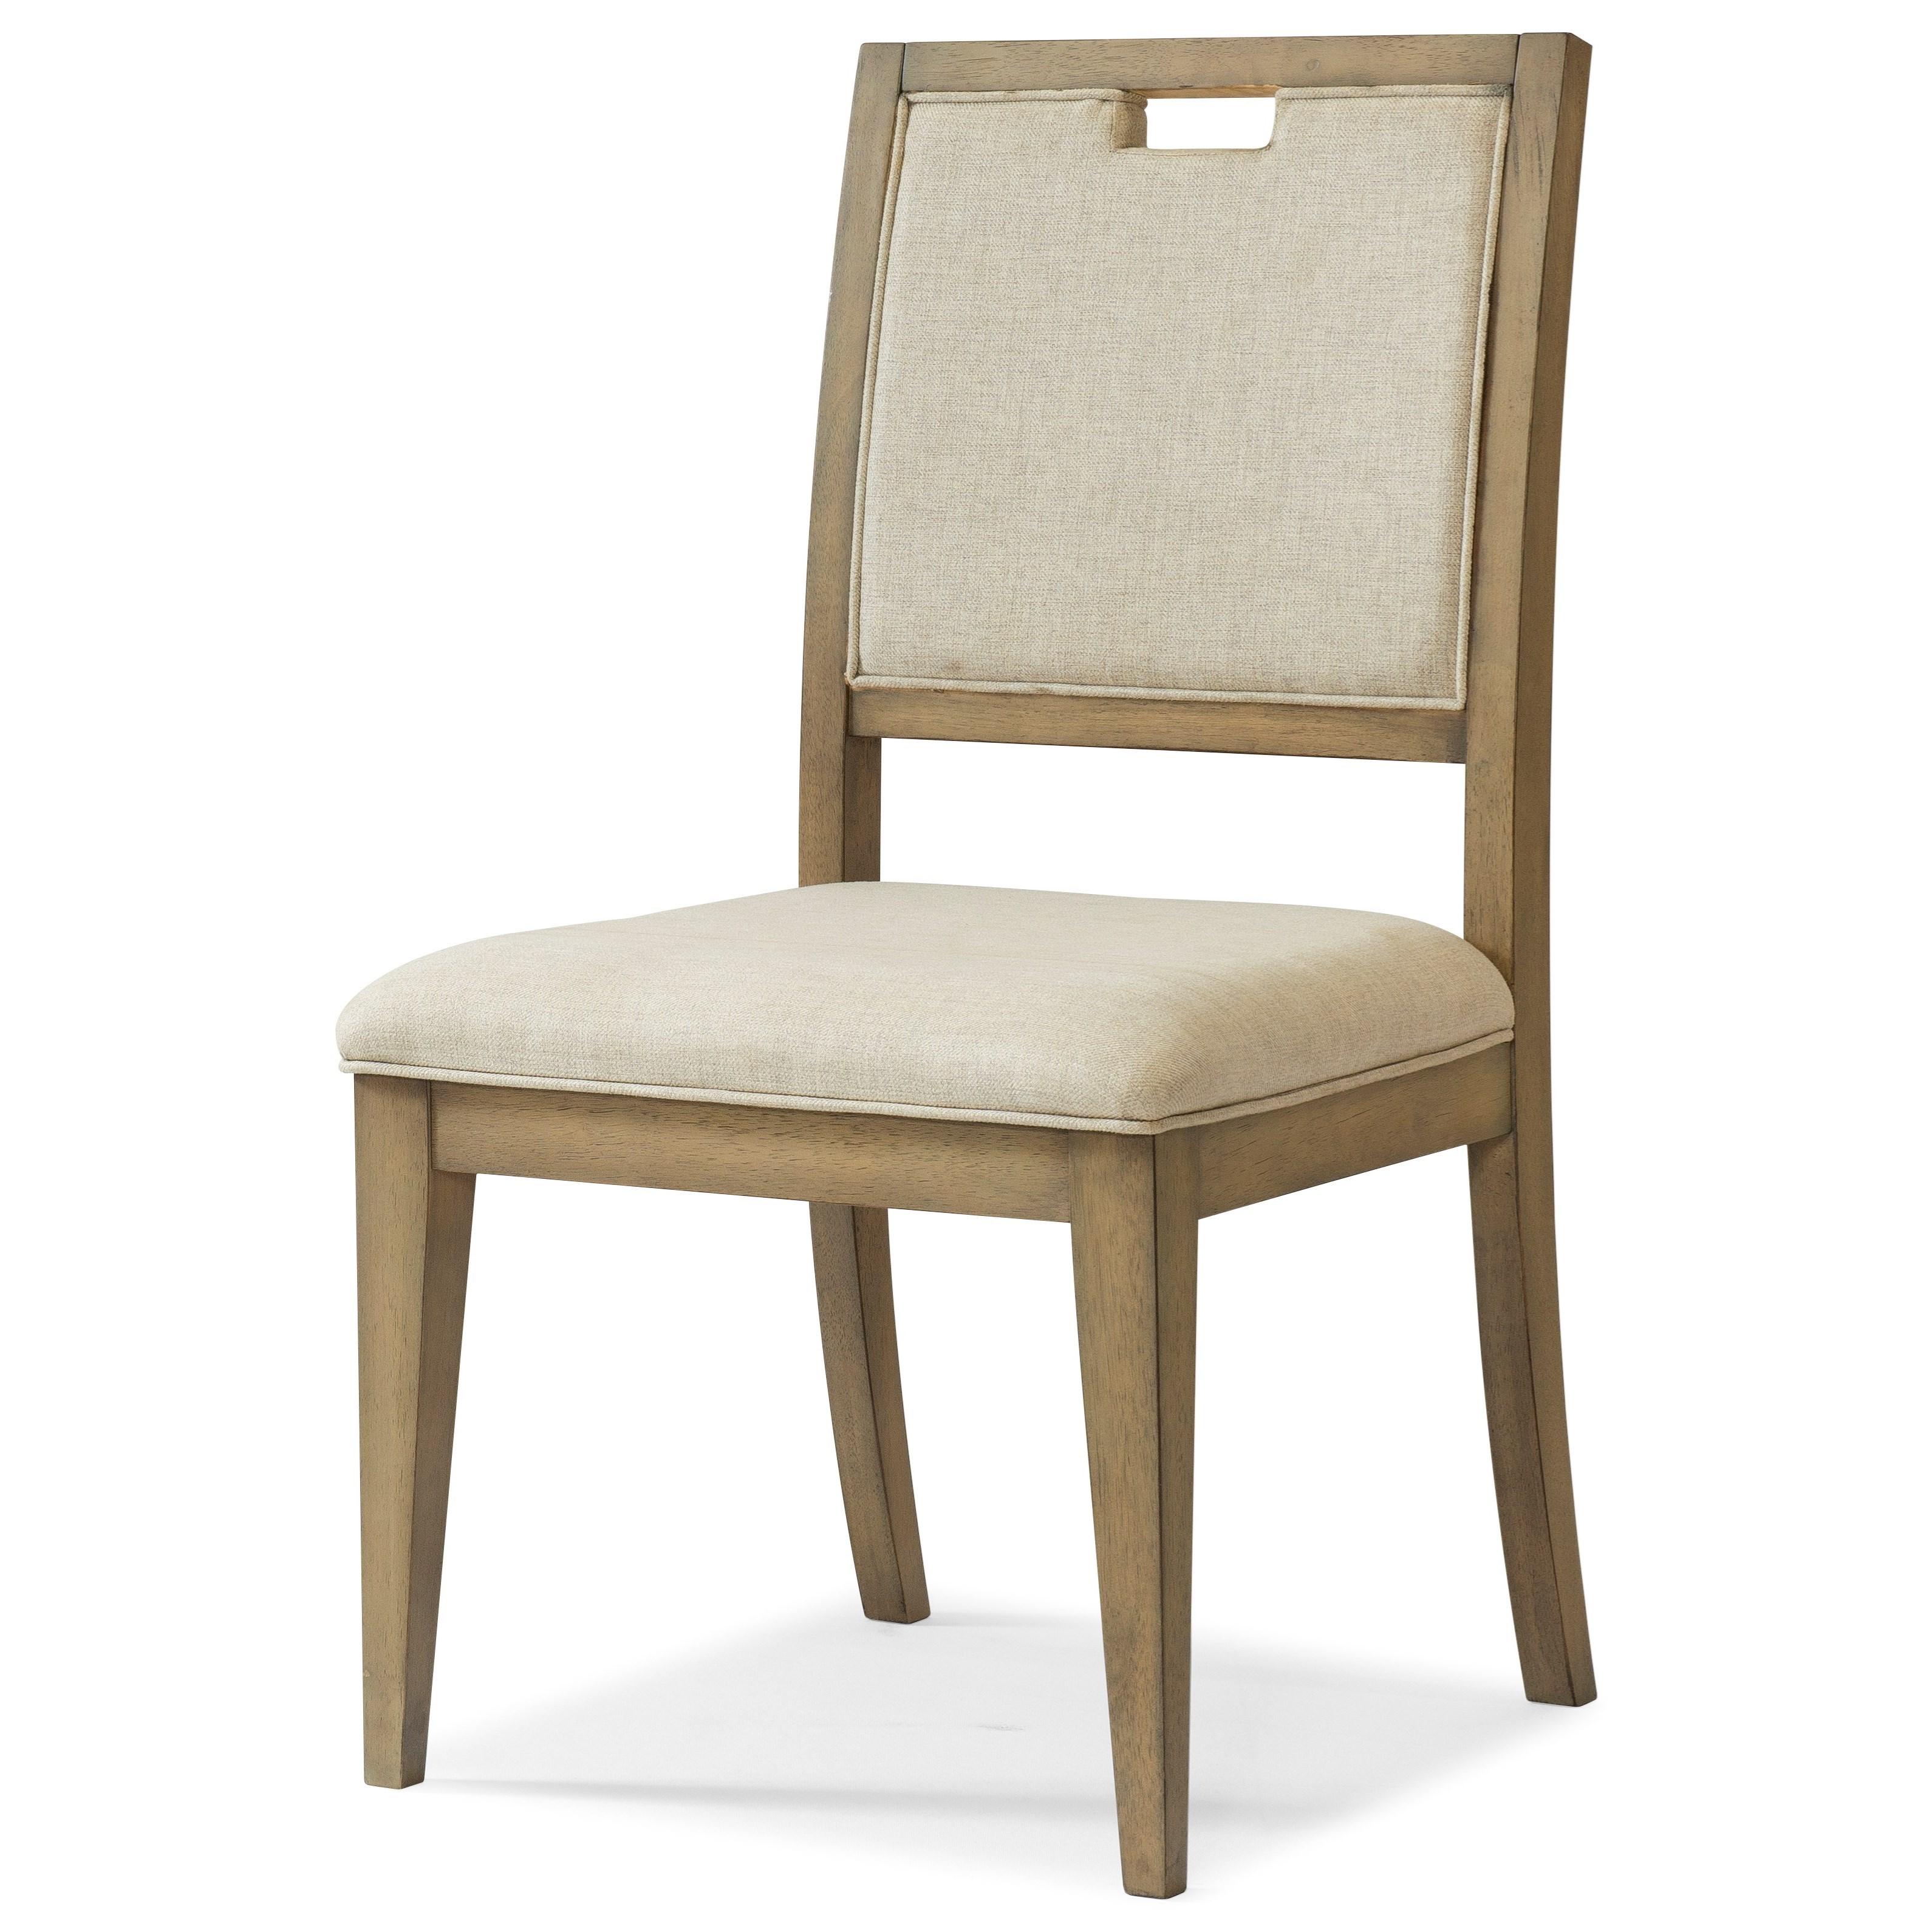 Klaussner International Melbourne Dining Side Chair - Item Number: 680-900SU